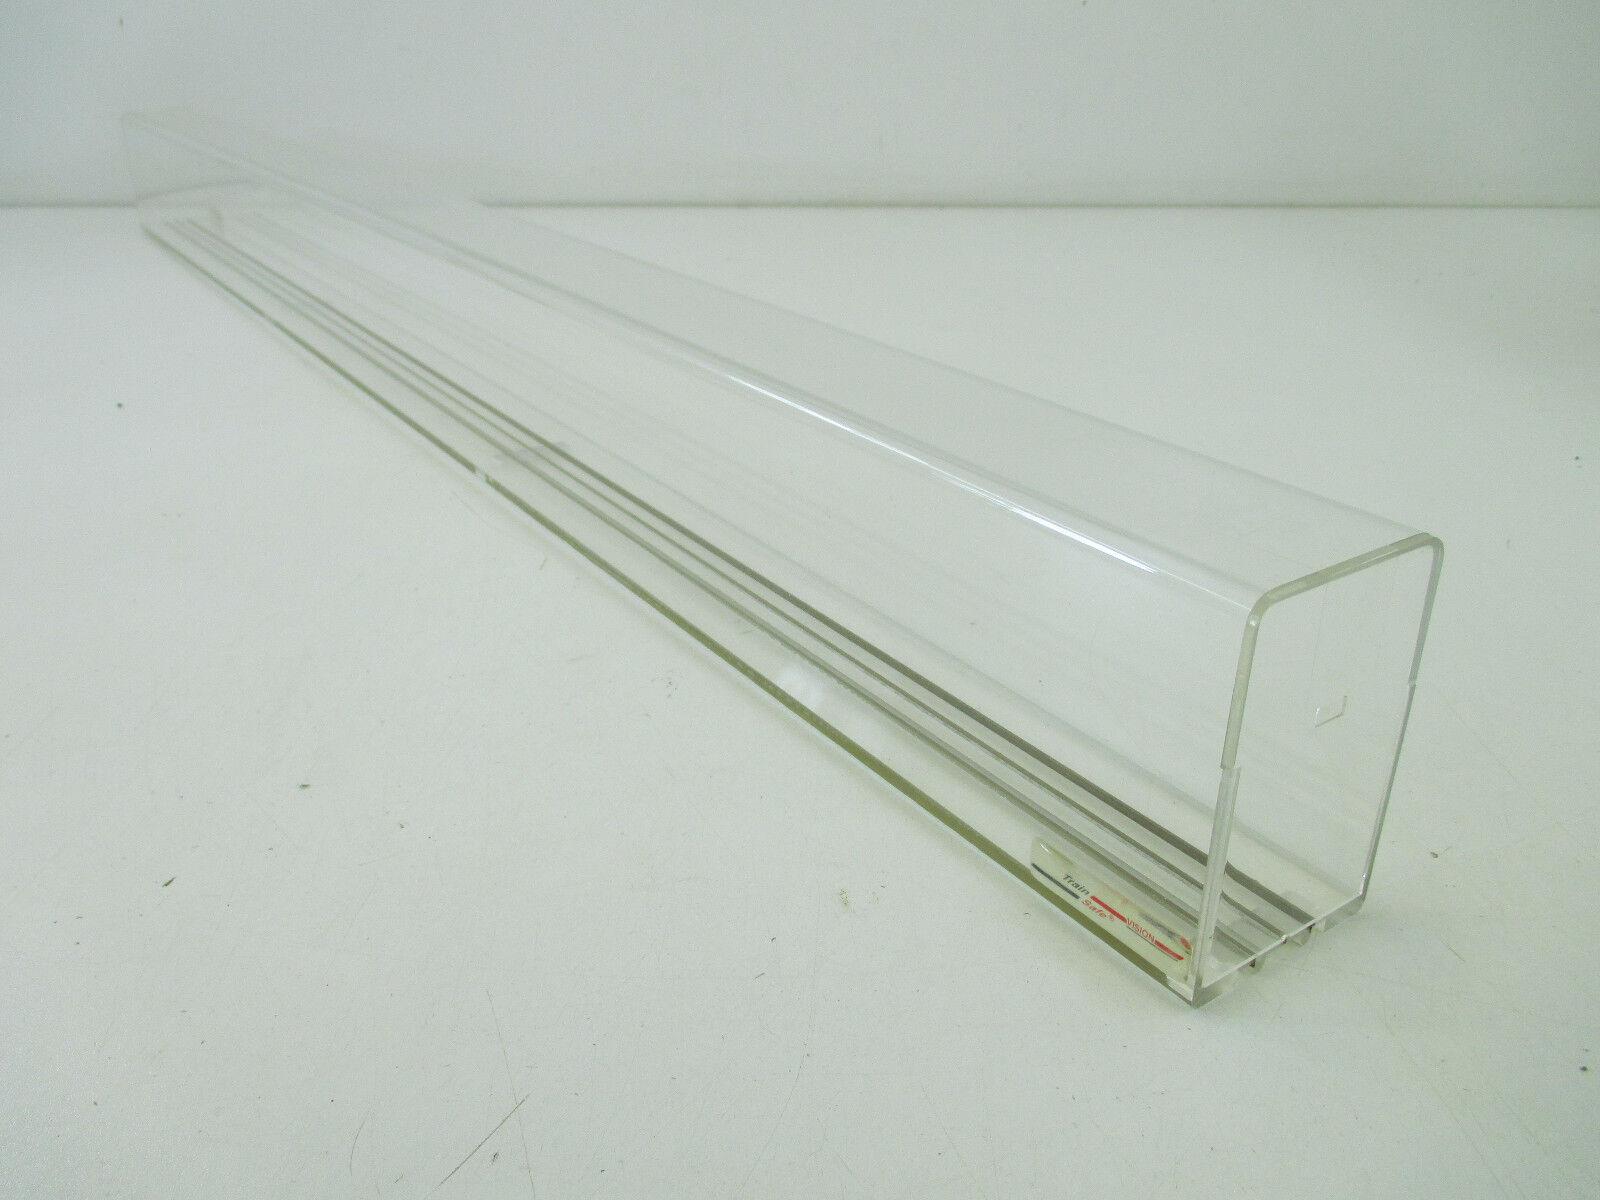 Train-Safe-Vision Trail h0 100 cm long Plexiglas Tube Passable by fw1444